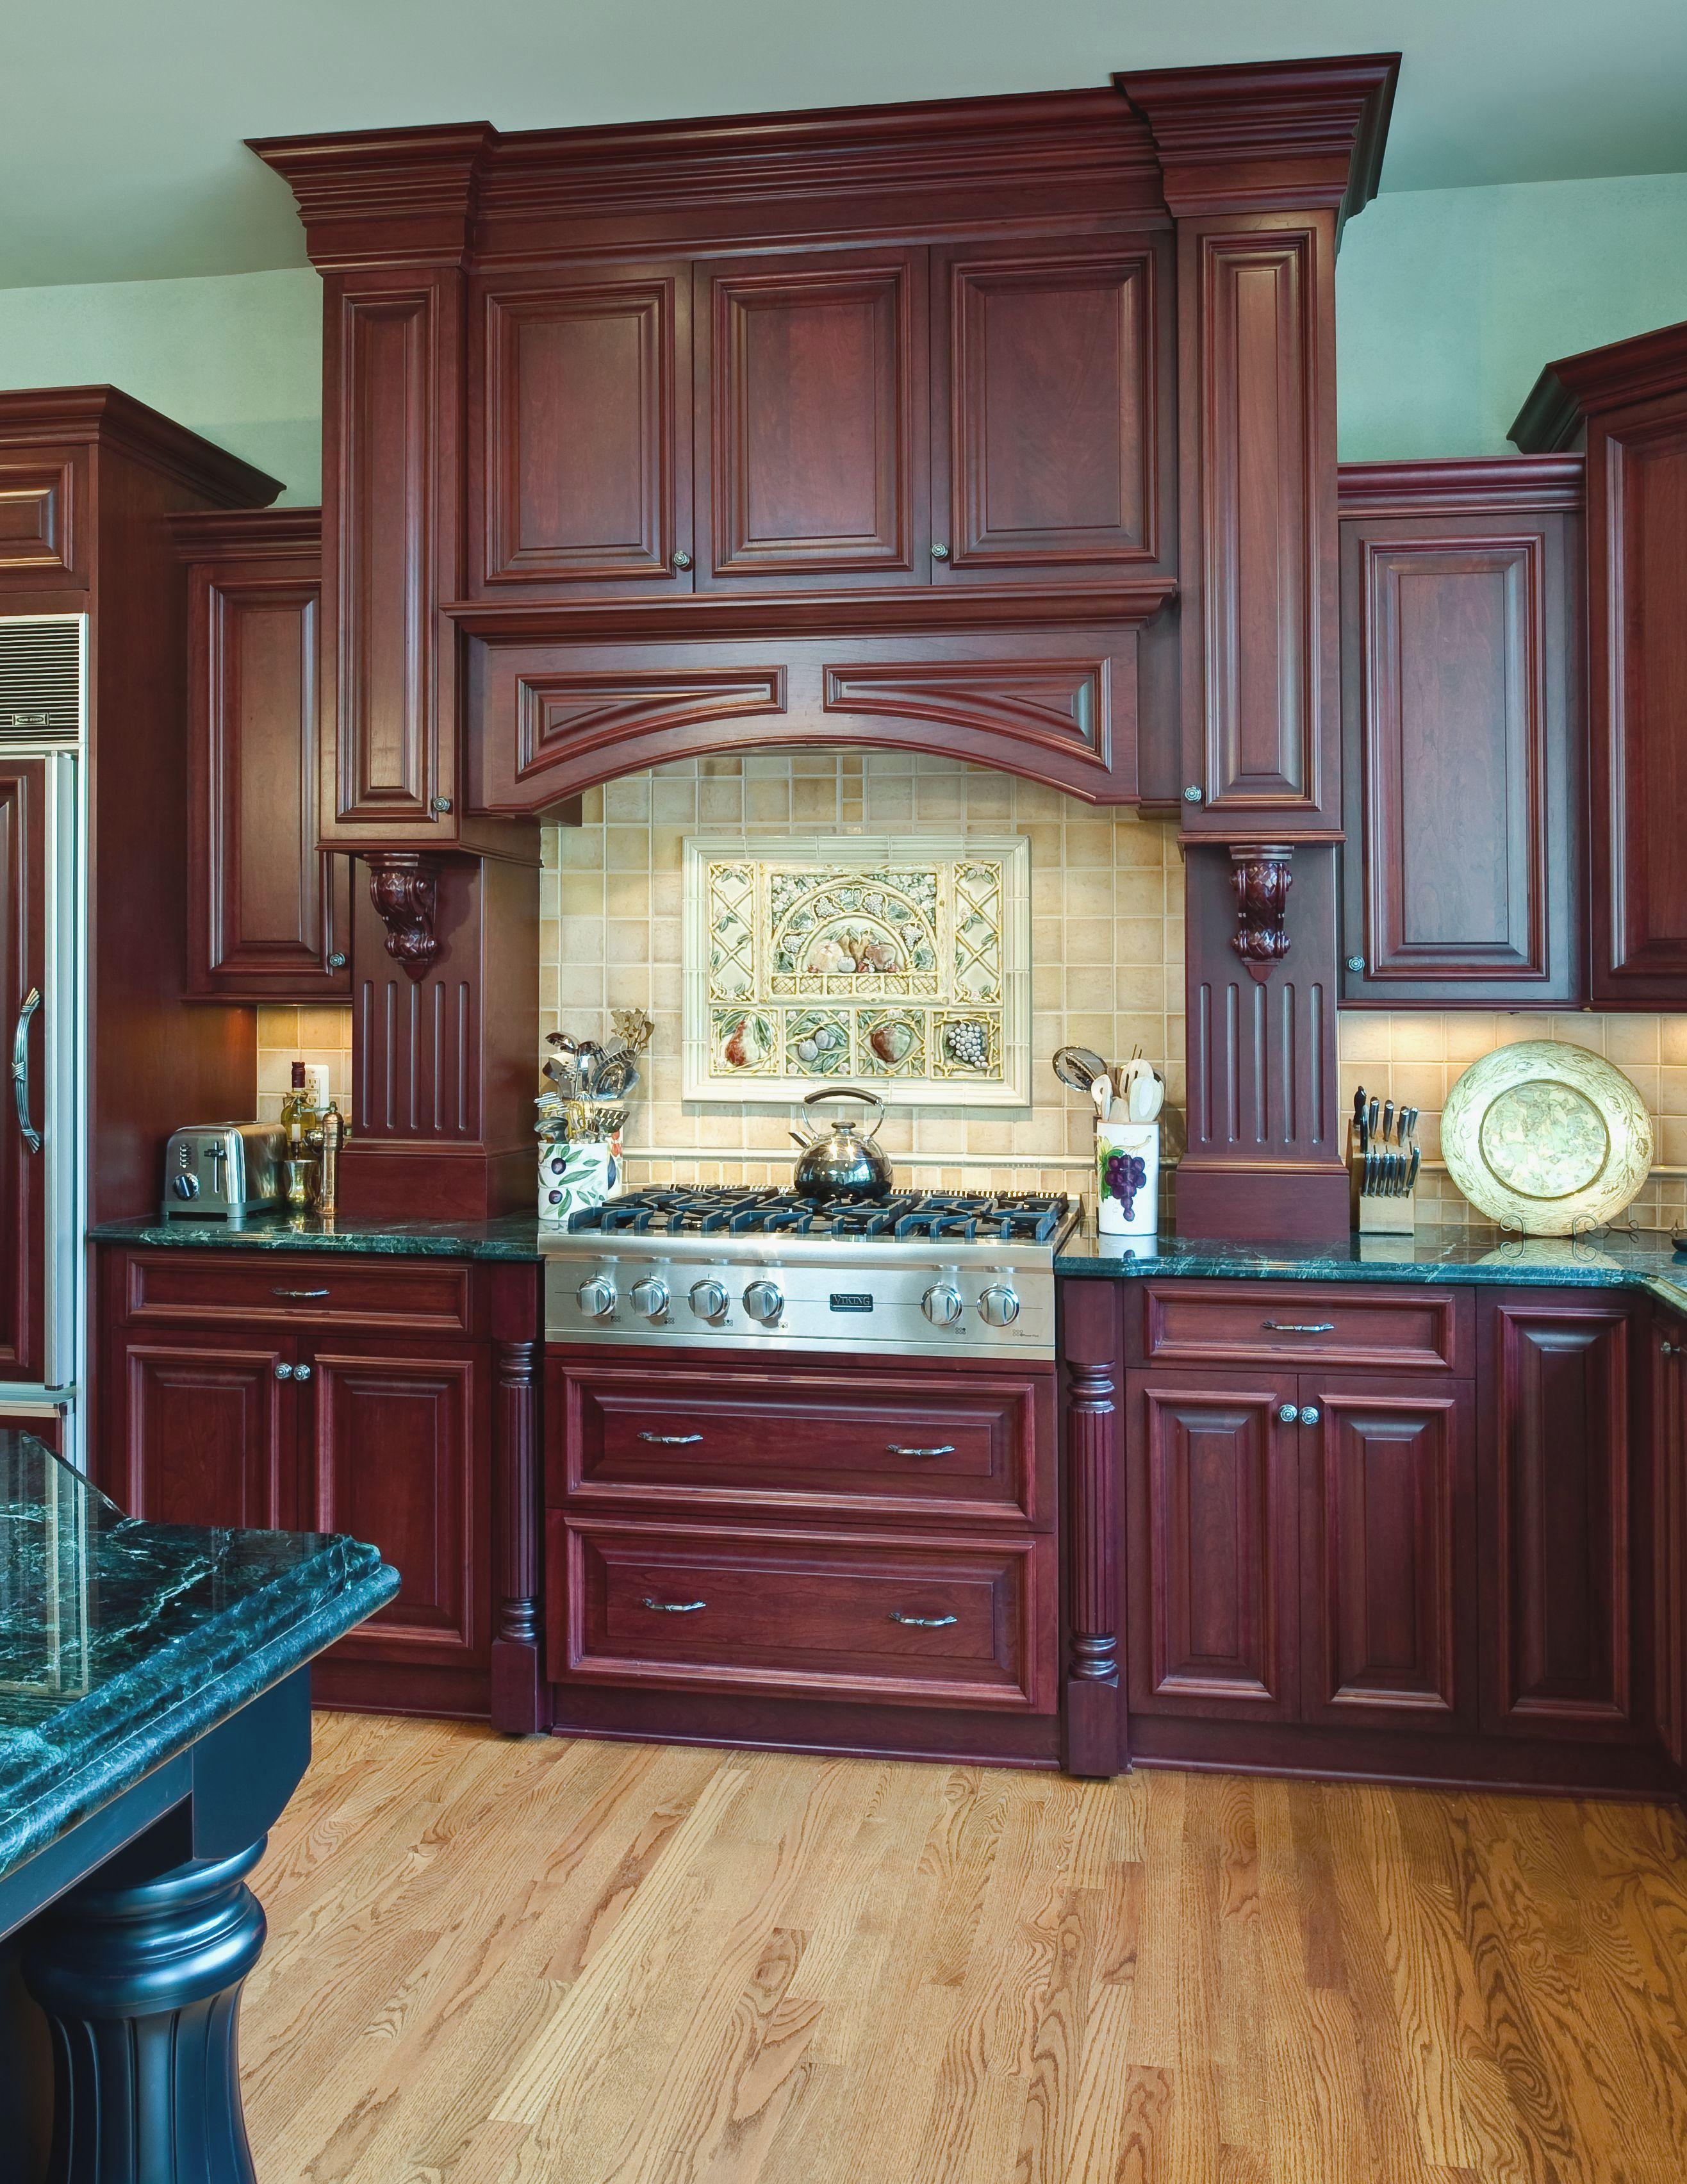 27 Amazing Cherry Wood Kitchens Simplehomy Dot Com Cherry Wood Kitchen Cabinets Cherry Wood Kitchens Cherry Cabinets Kitchen